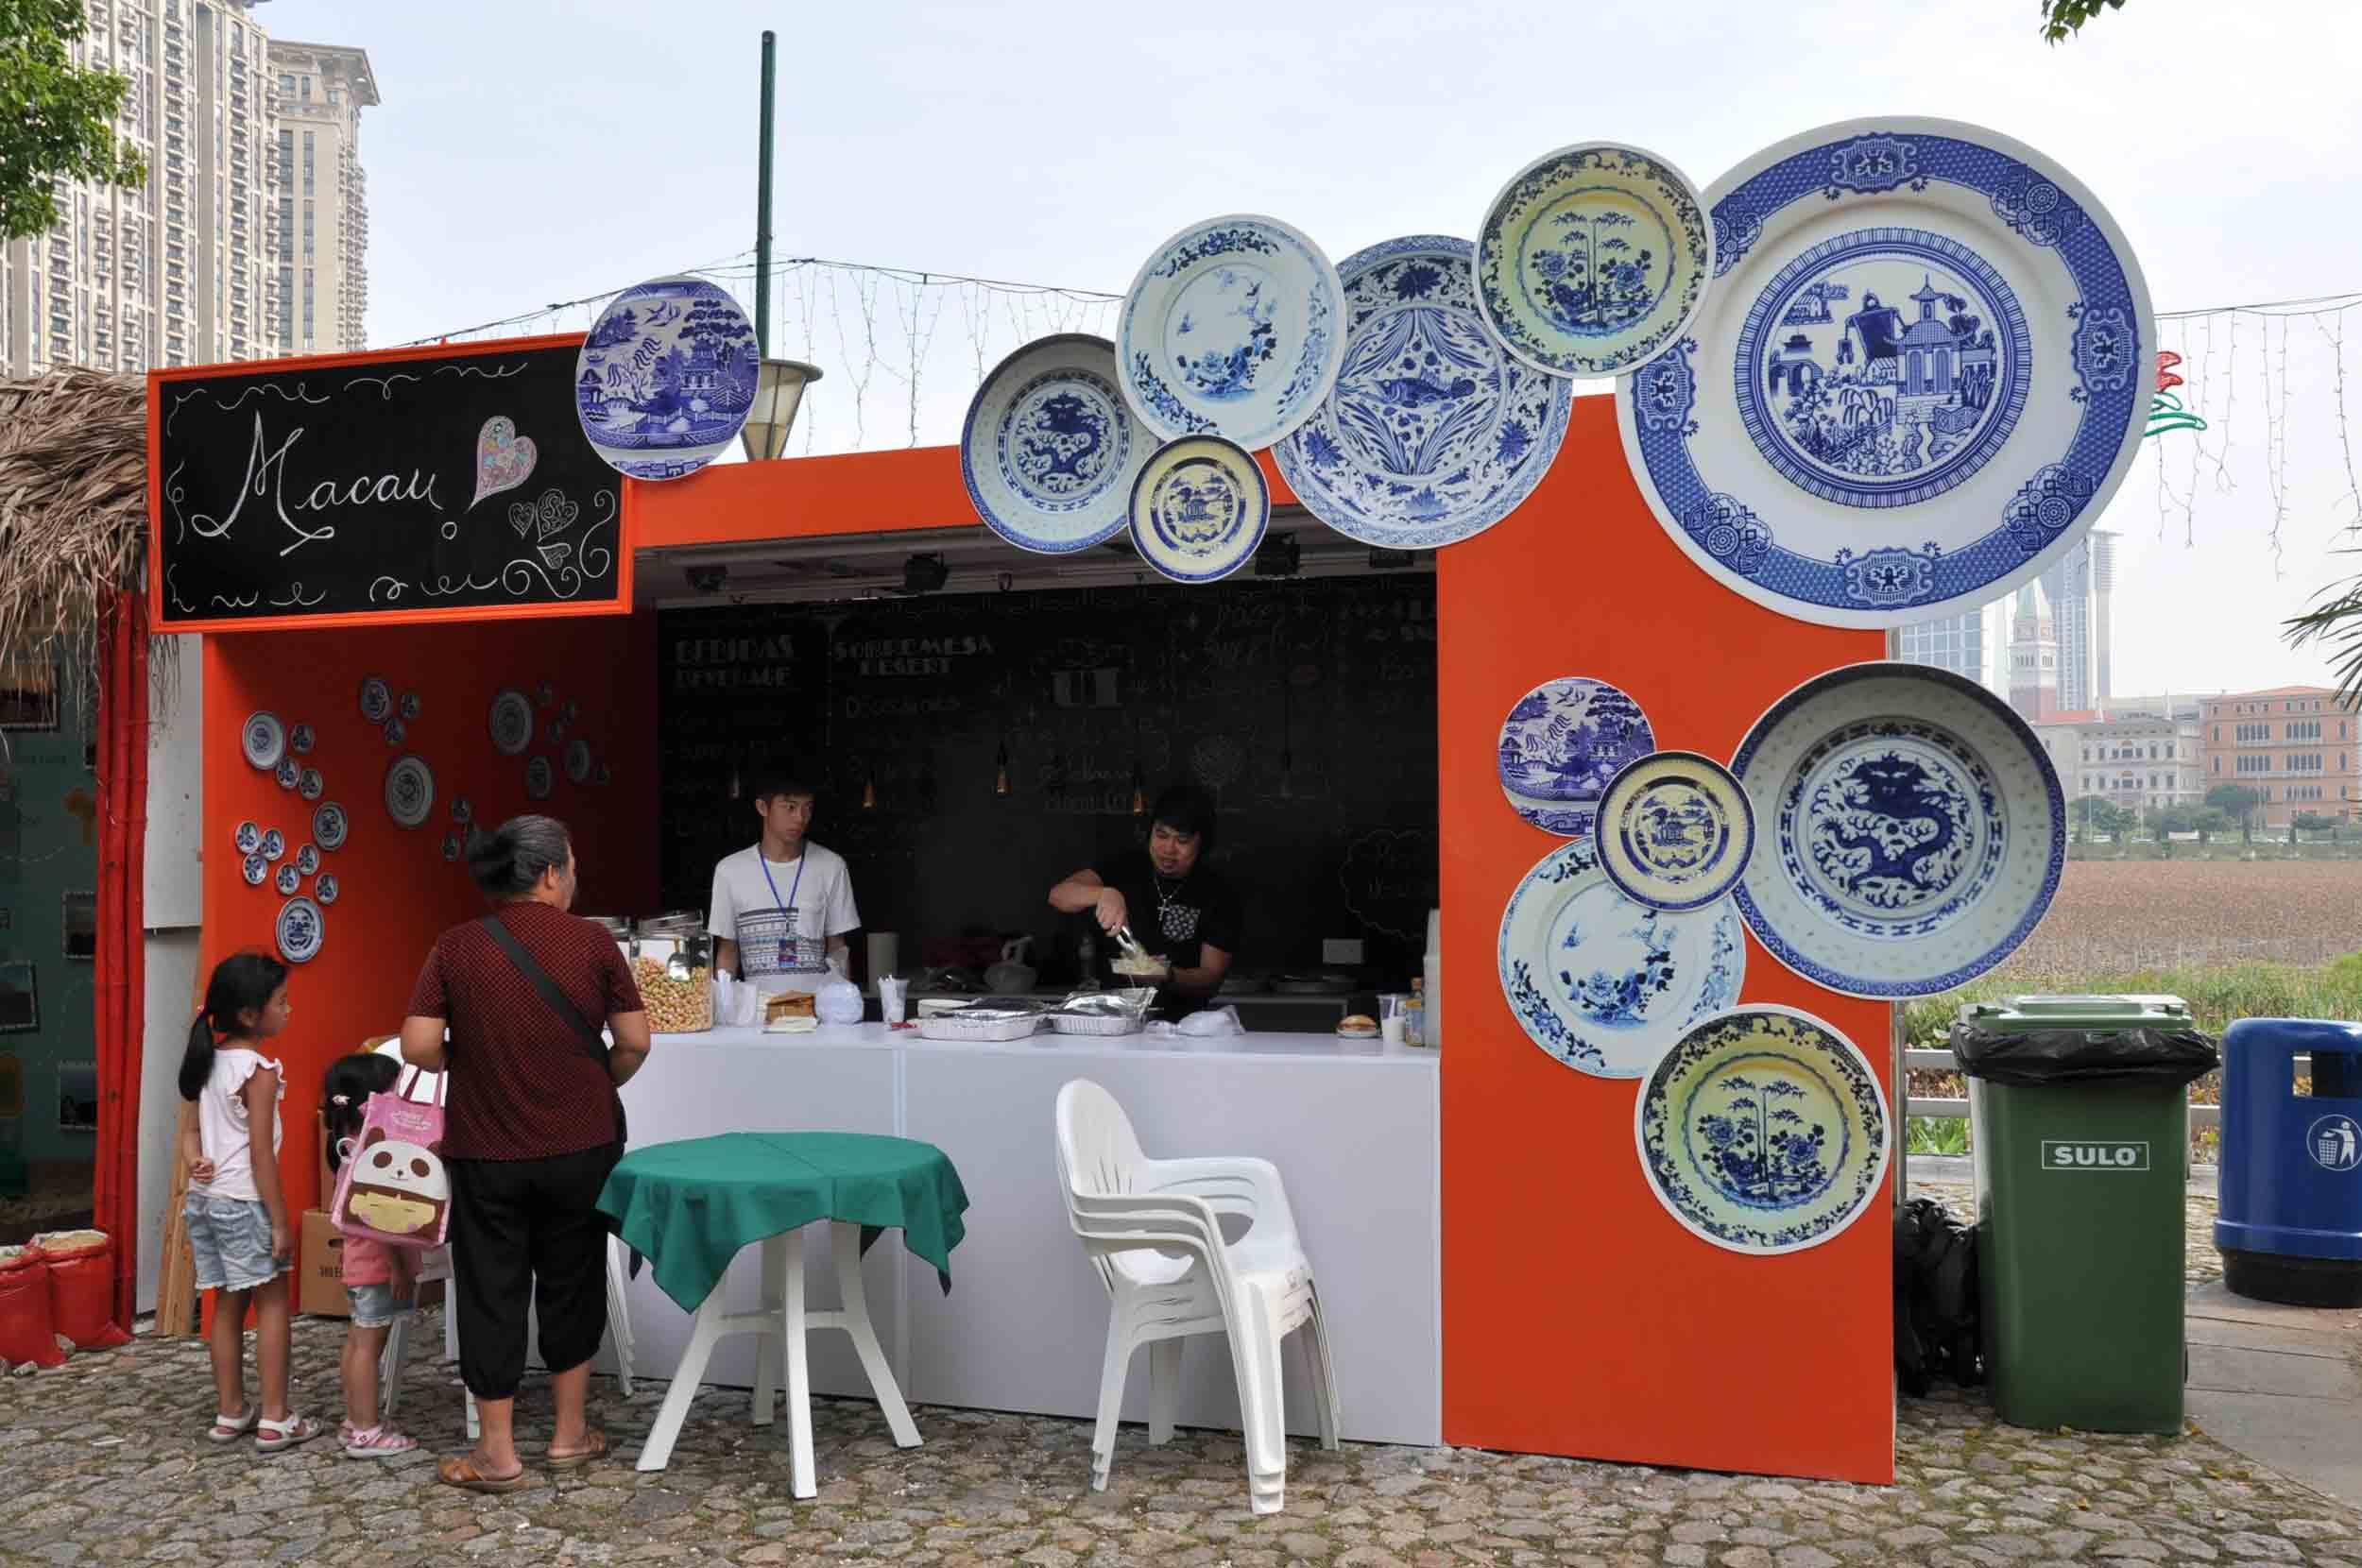 Lusofonia Festival Macau booth